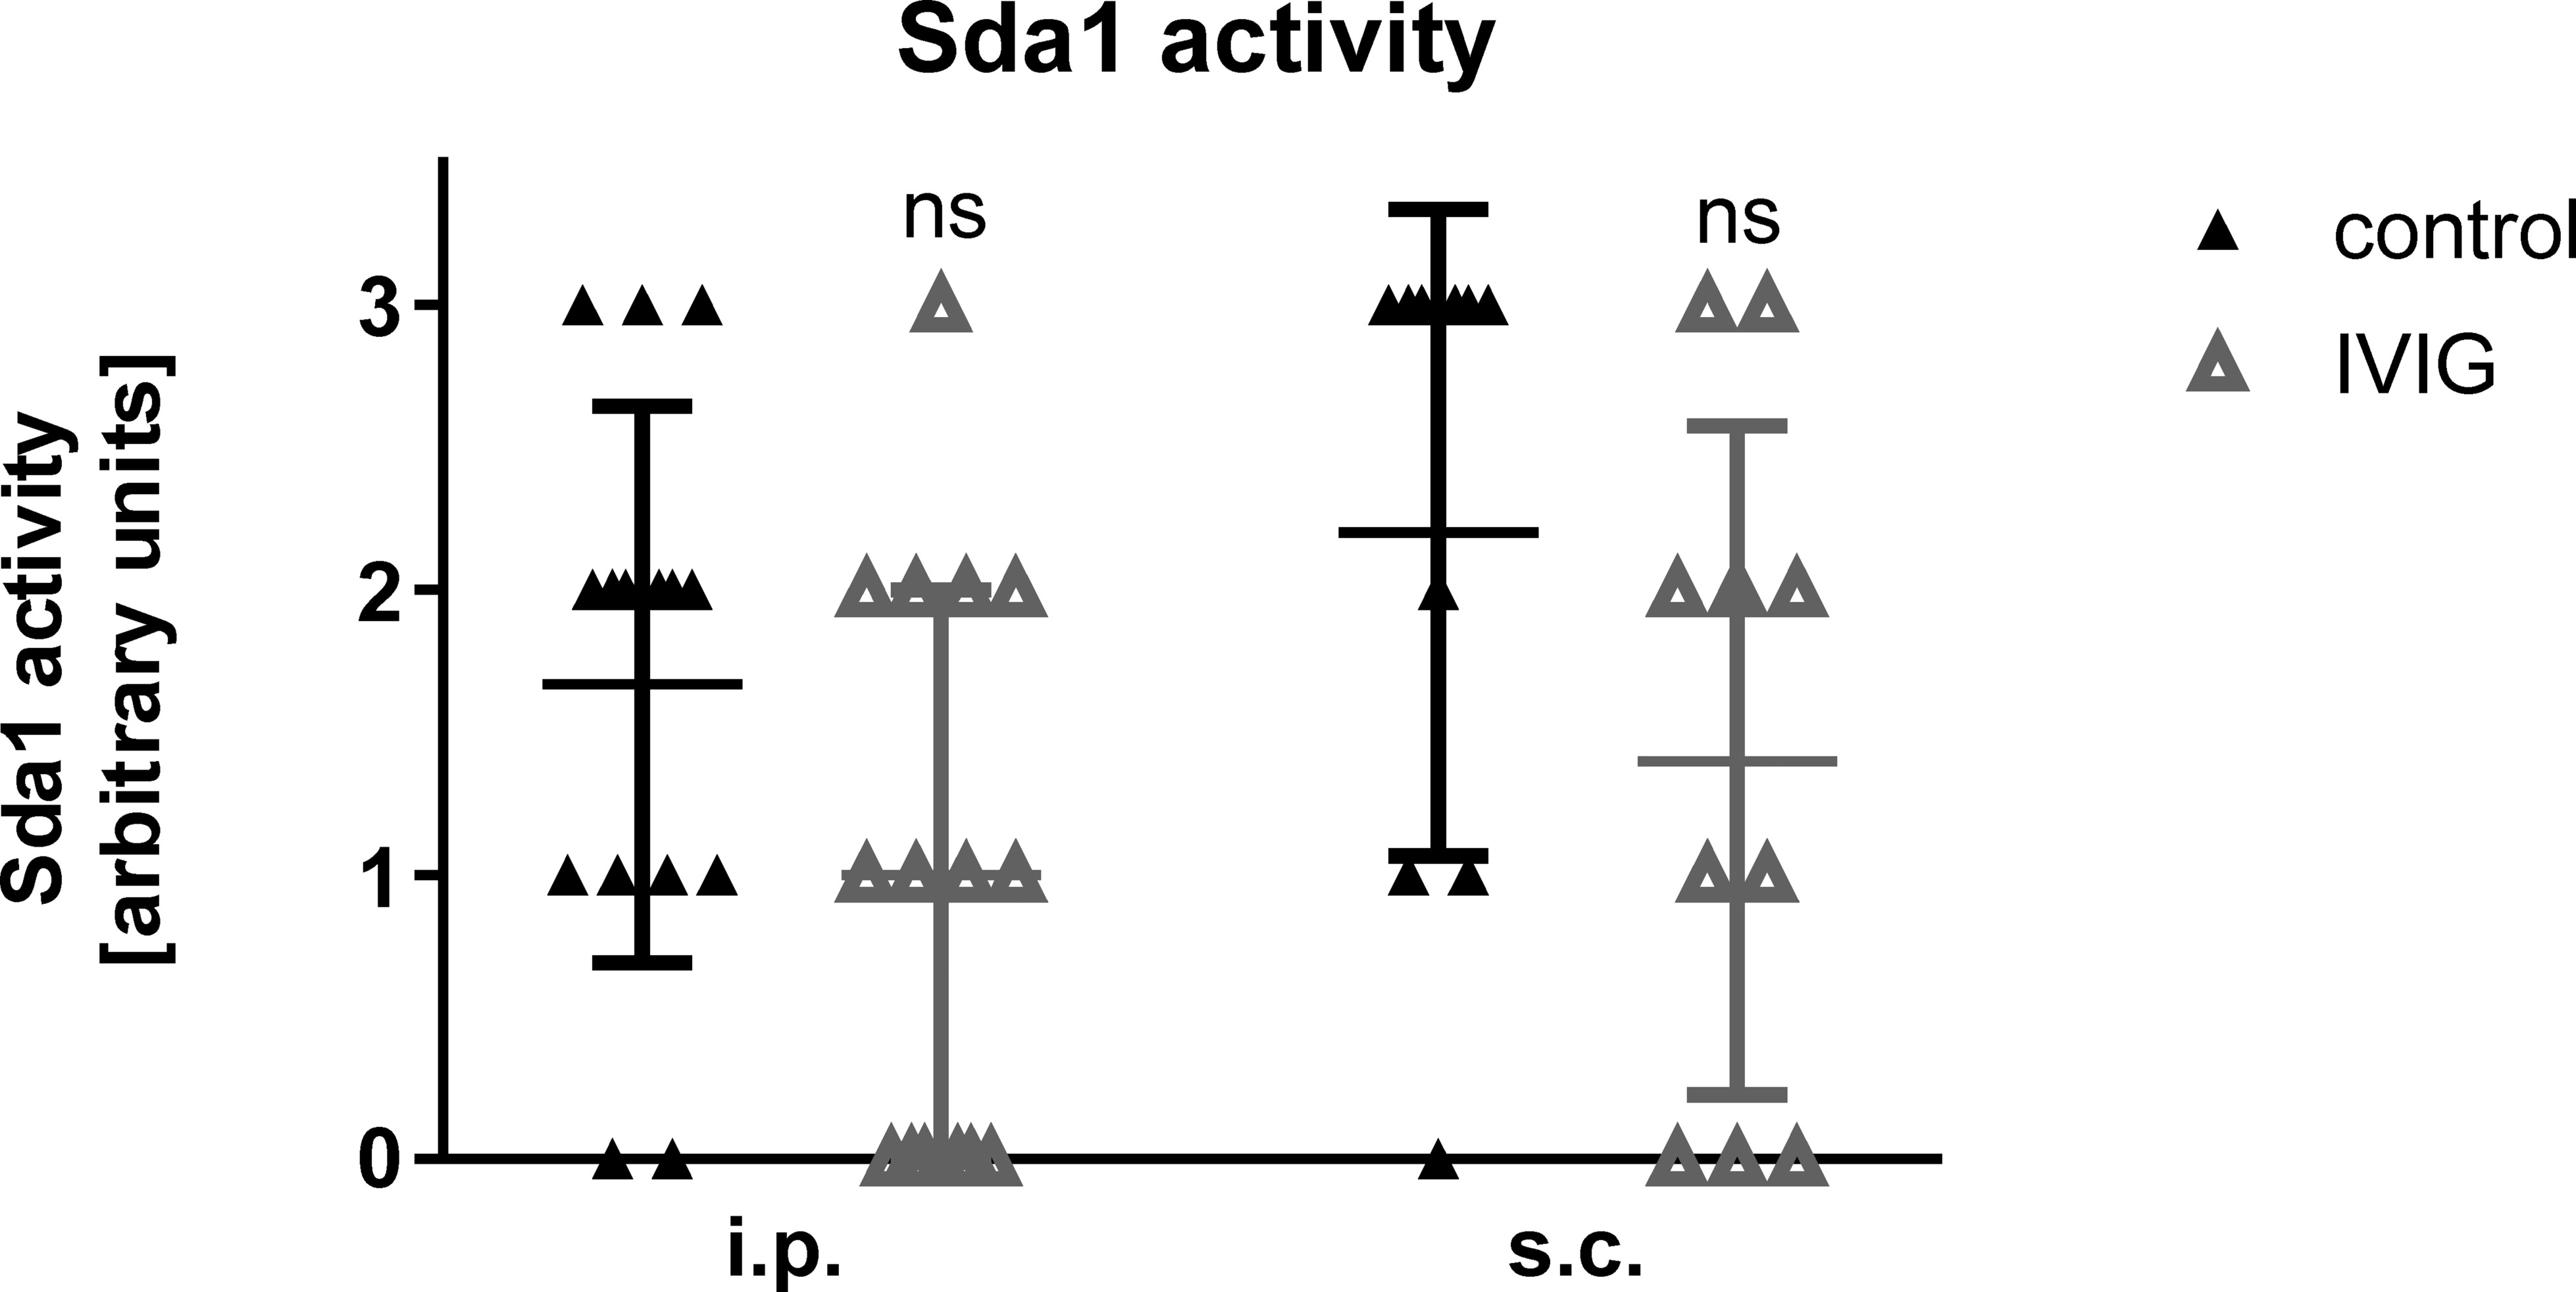 Human polyspecific immunoglobulin attenuates group A